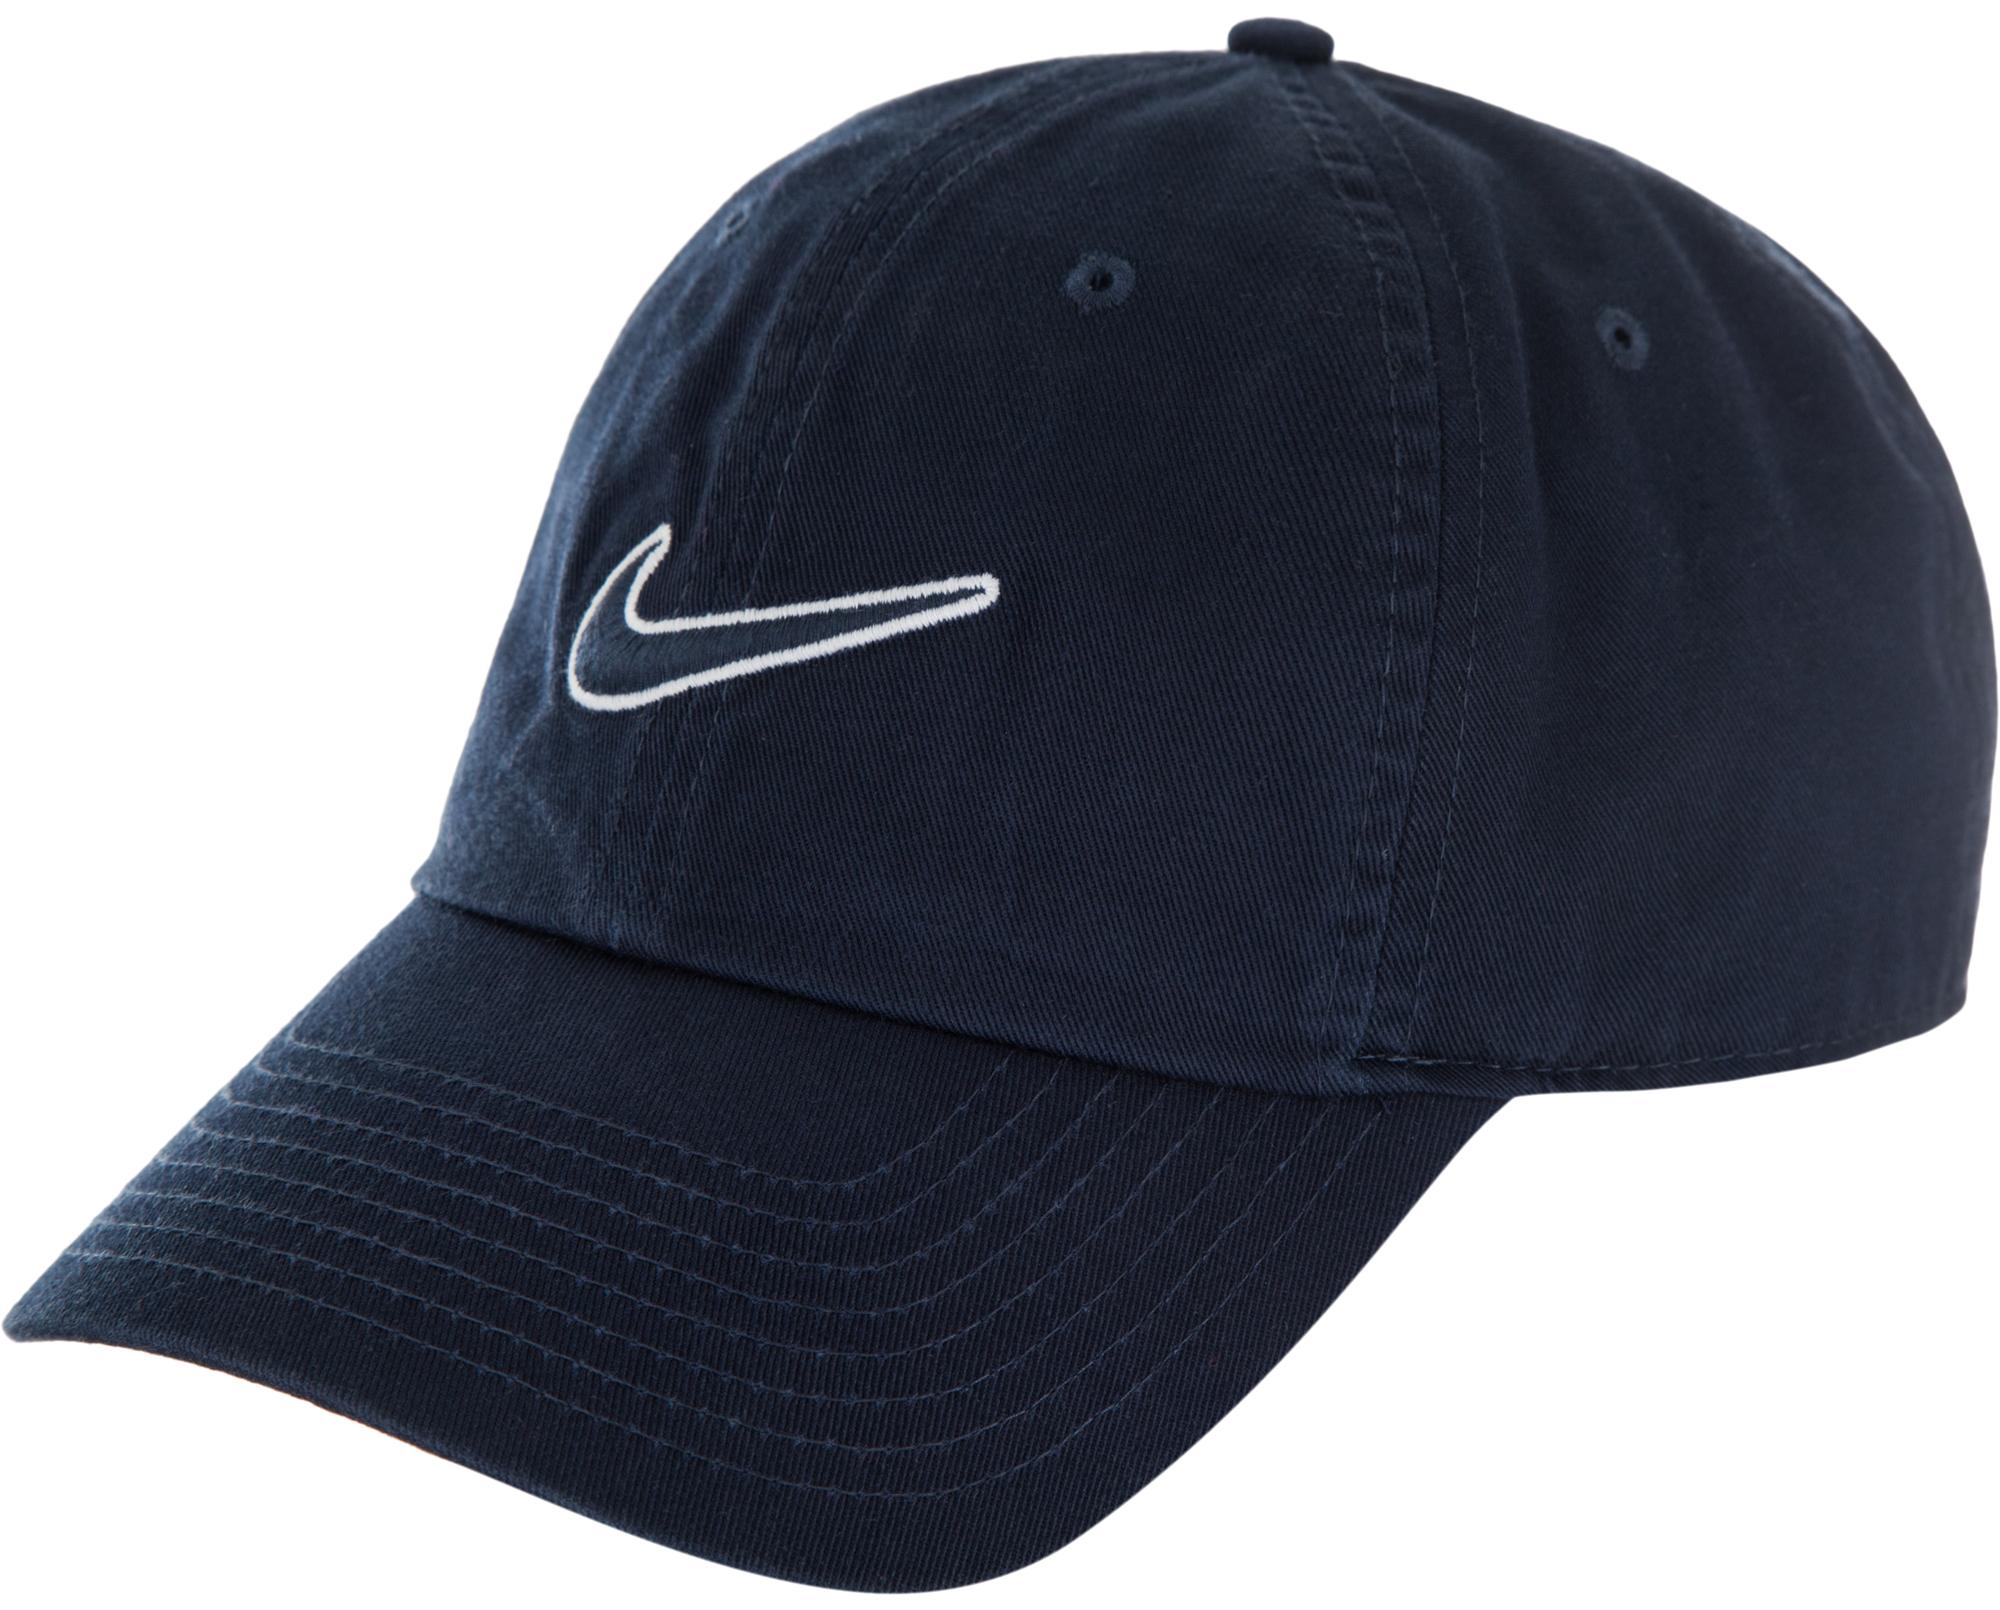 Nike Бейсболка Nike Sportswear Essentials Heritage86, размер Без размера